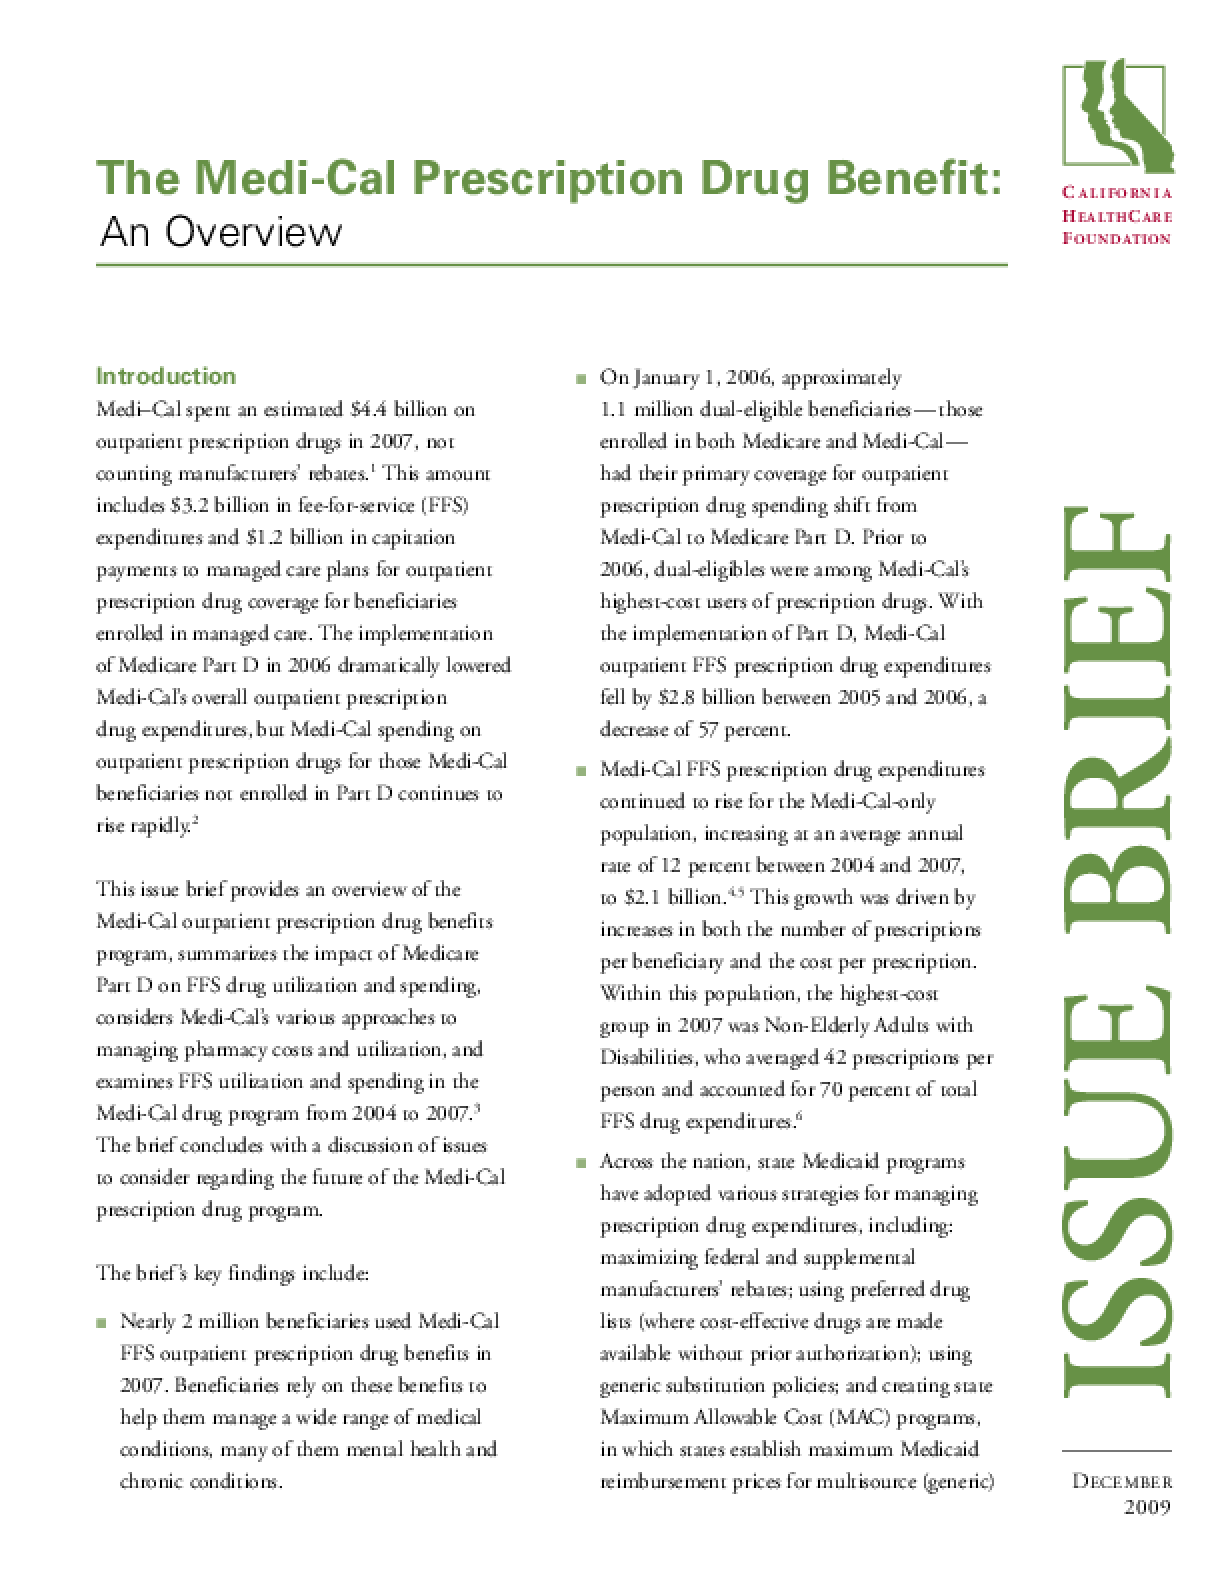 The Medi-Cal Prescription Drug Benefit: An Overview